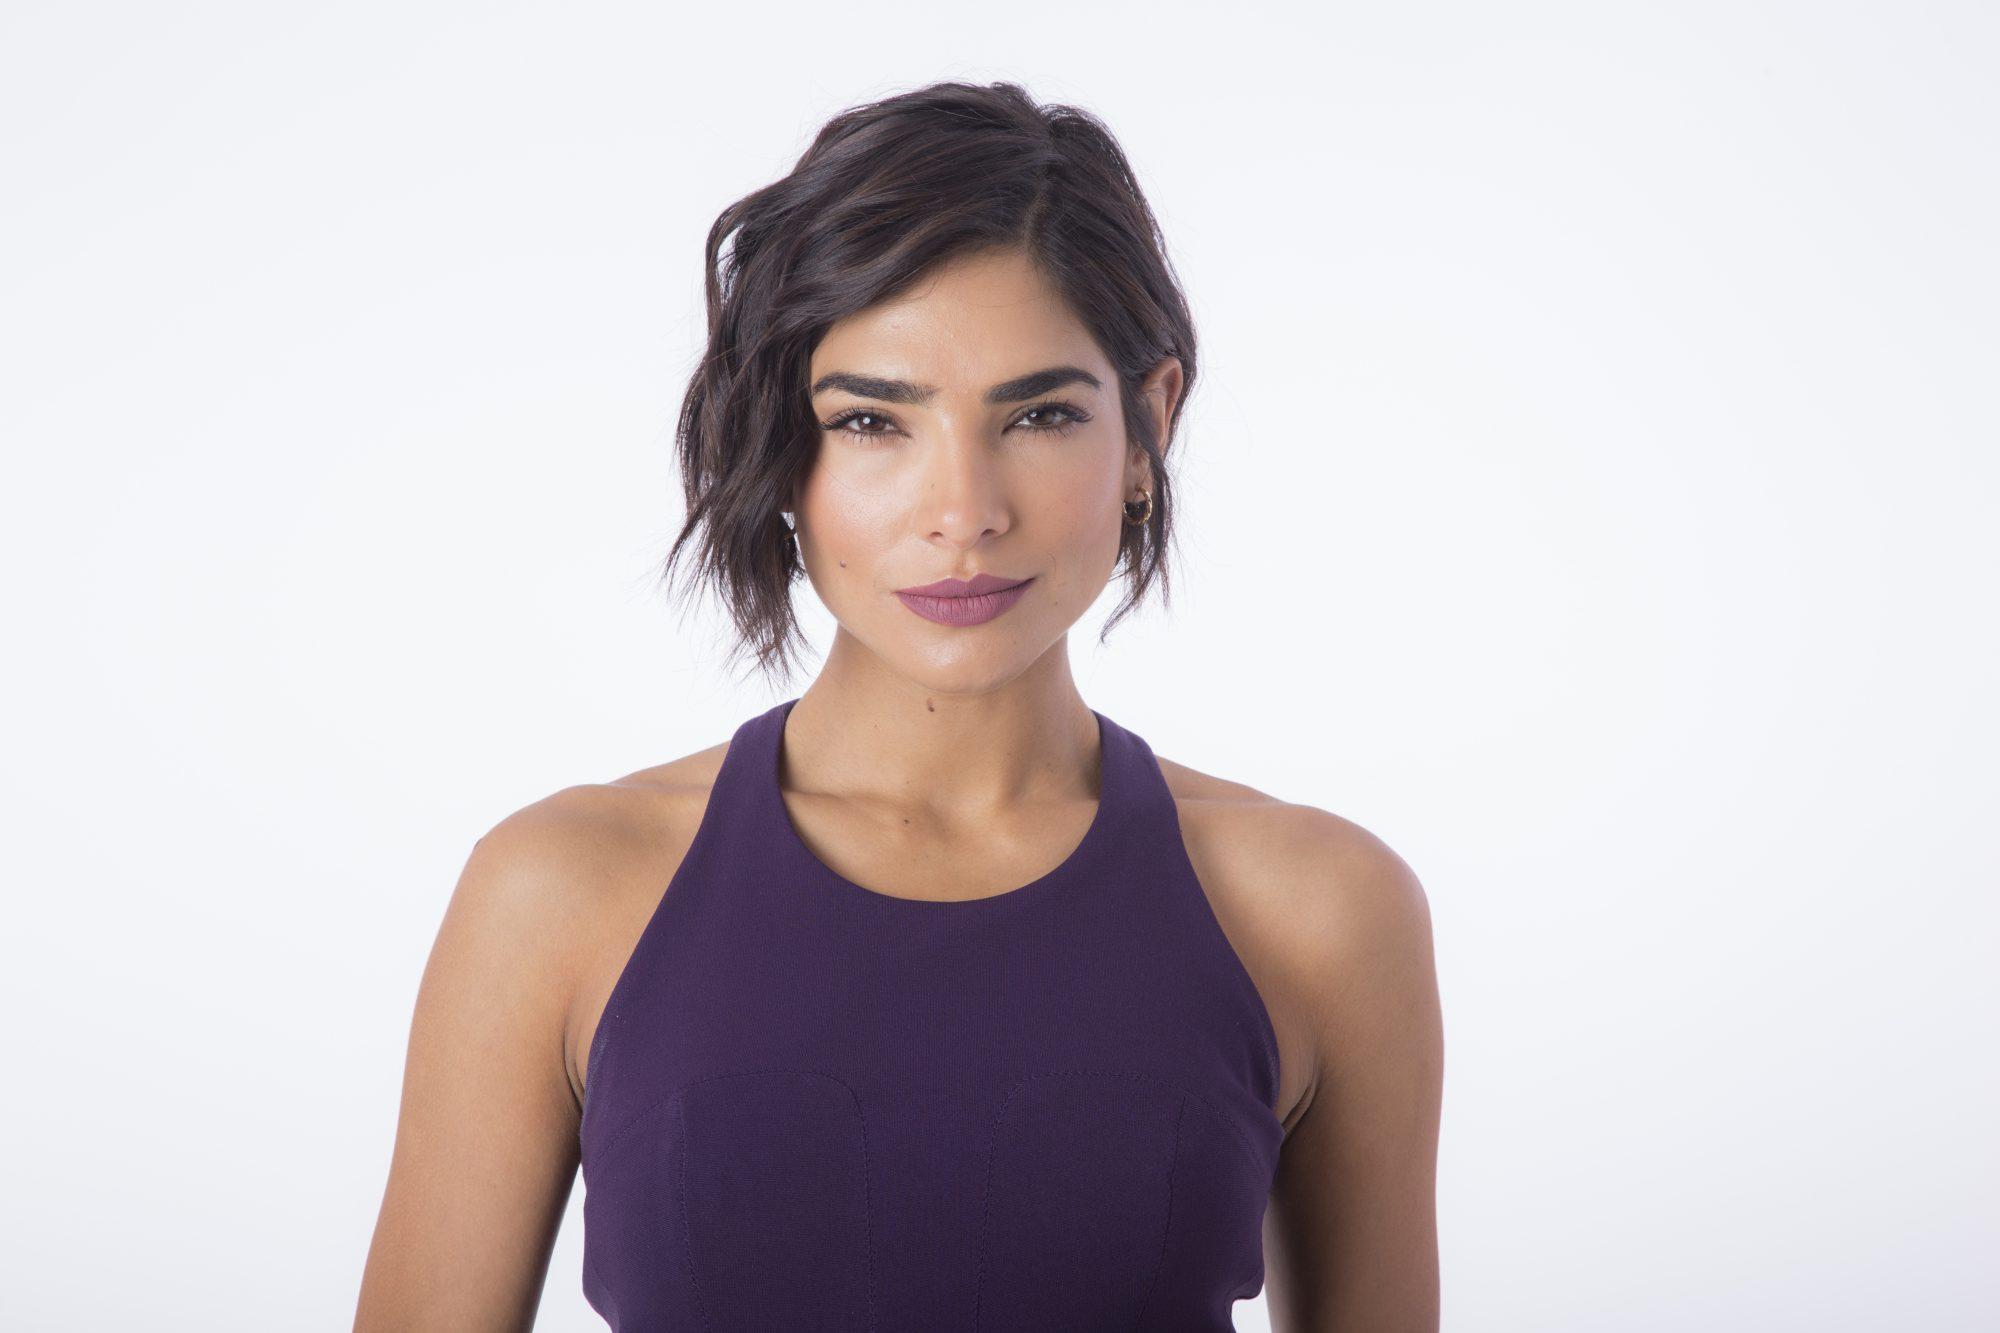 Alejandra Espinoza en Rubi 9